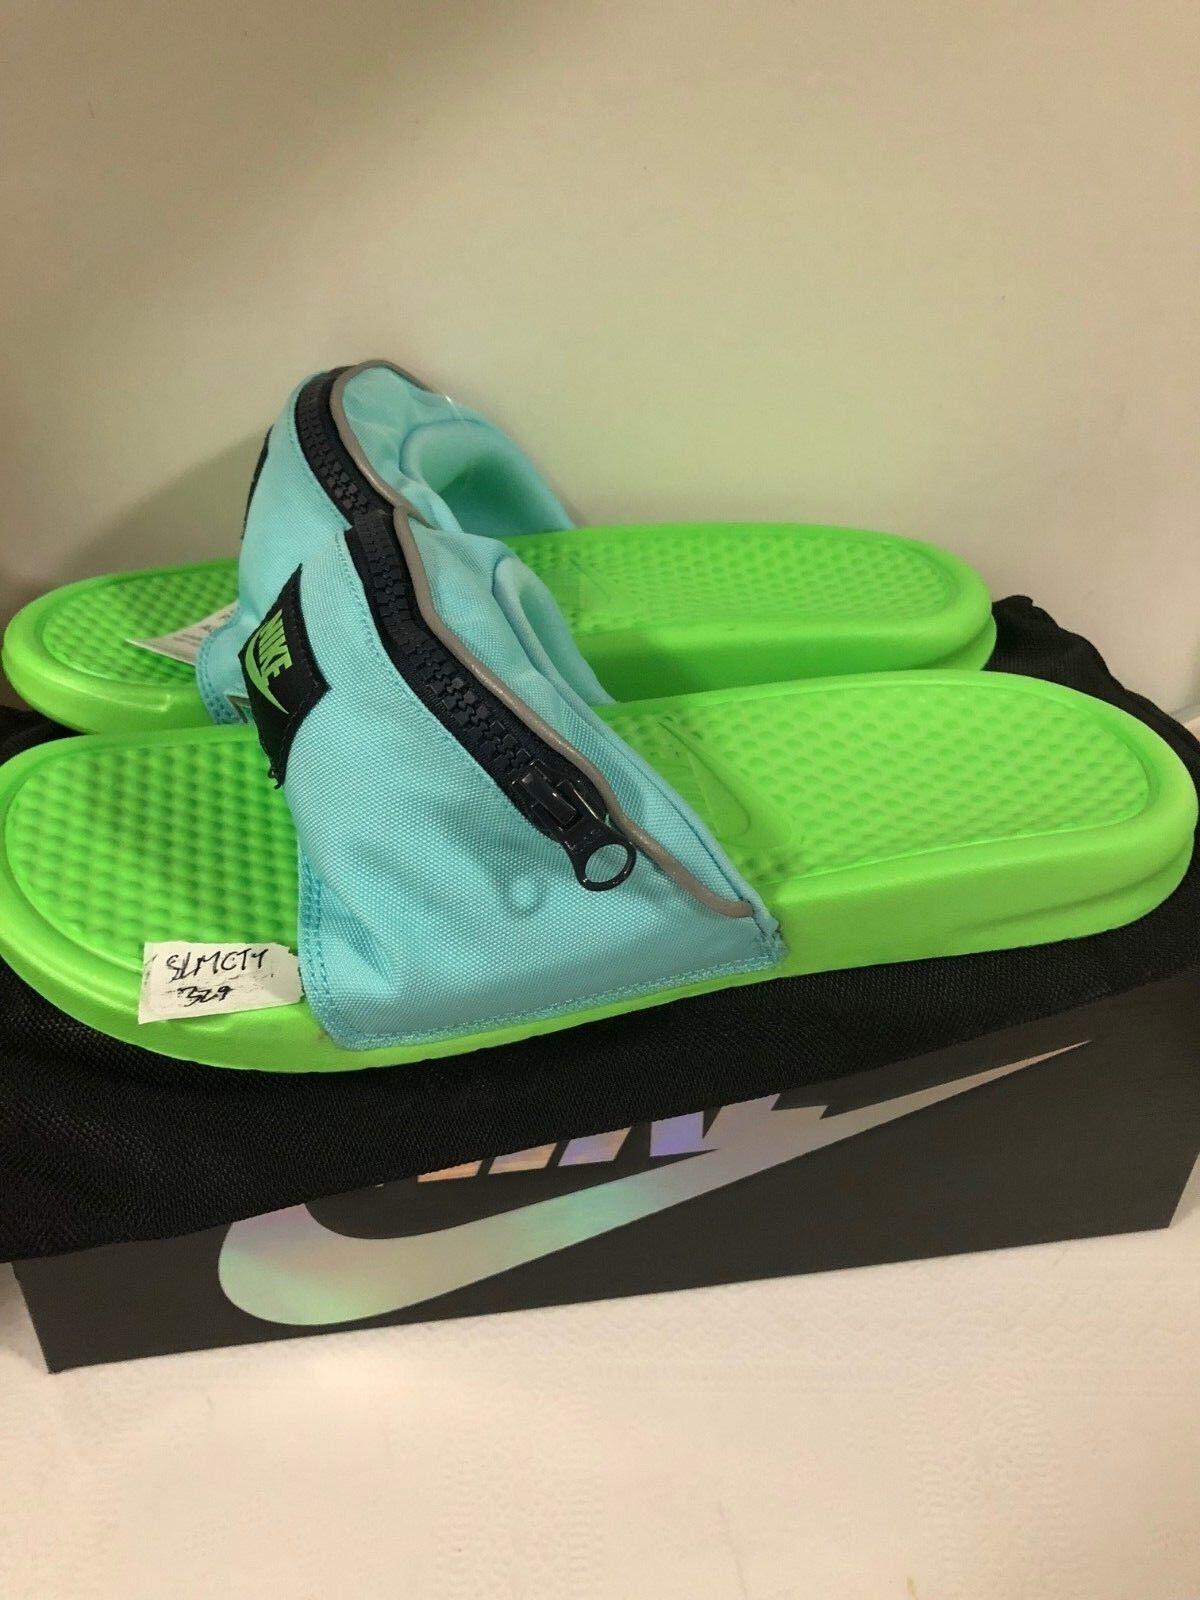 Nike Benassi JDI Fanny Ojotas Pack Aurora Verde Zapatillas diapositivas Ojotas Fanny AO1037300 592798